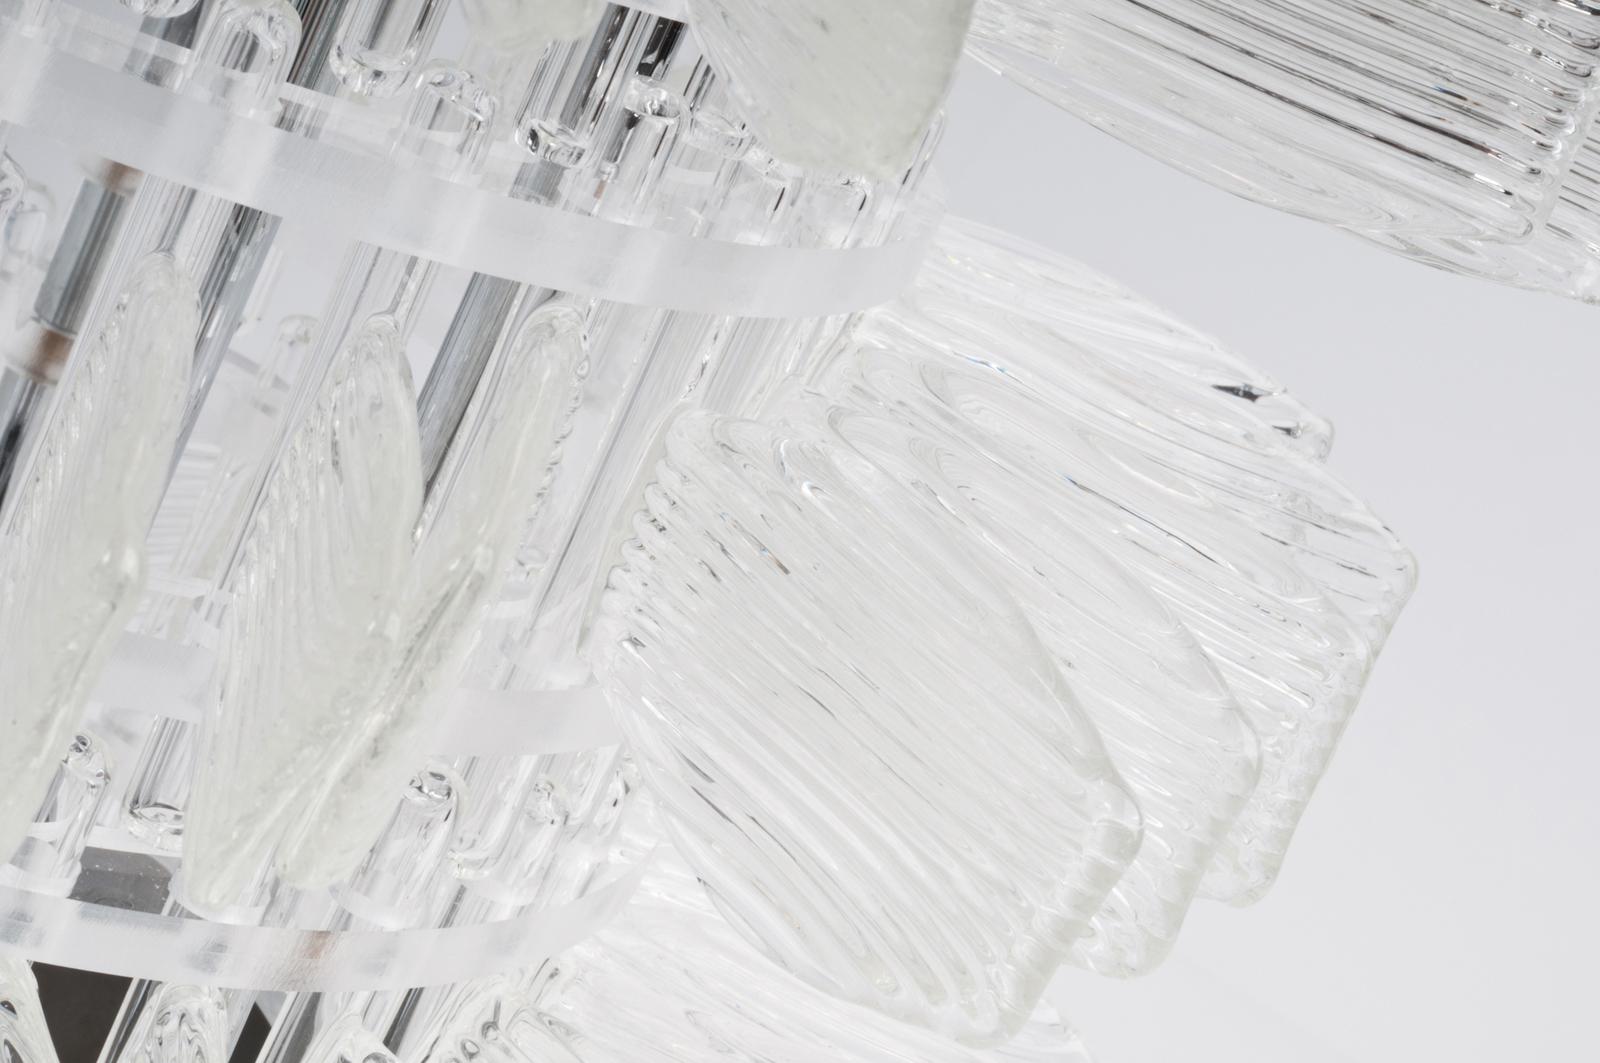 anemone-32-table-chrome-cristal-crystal-veronese-maurizio-galante-tal-lancman-101.jpg